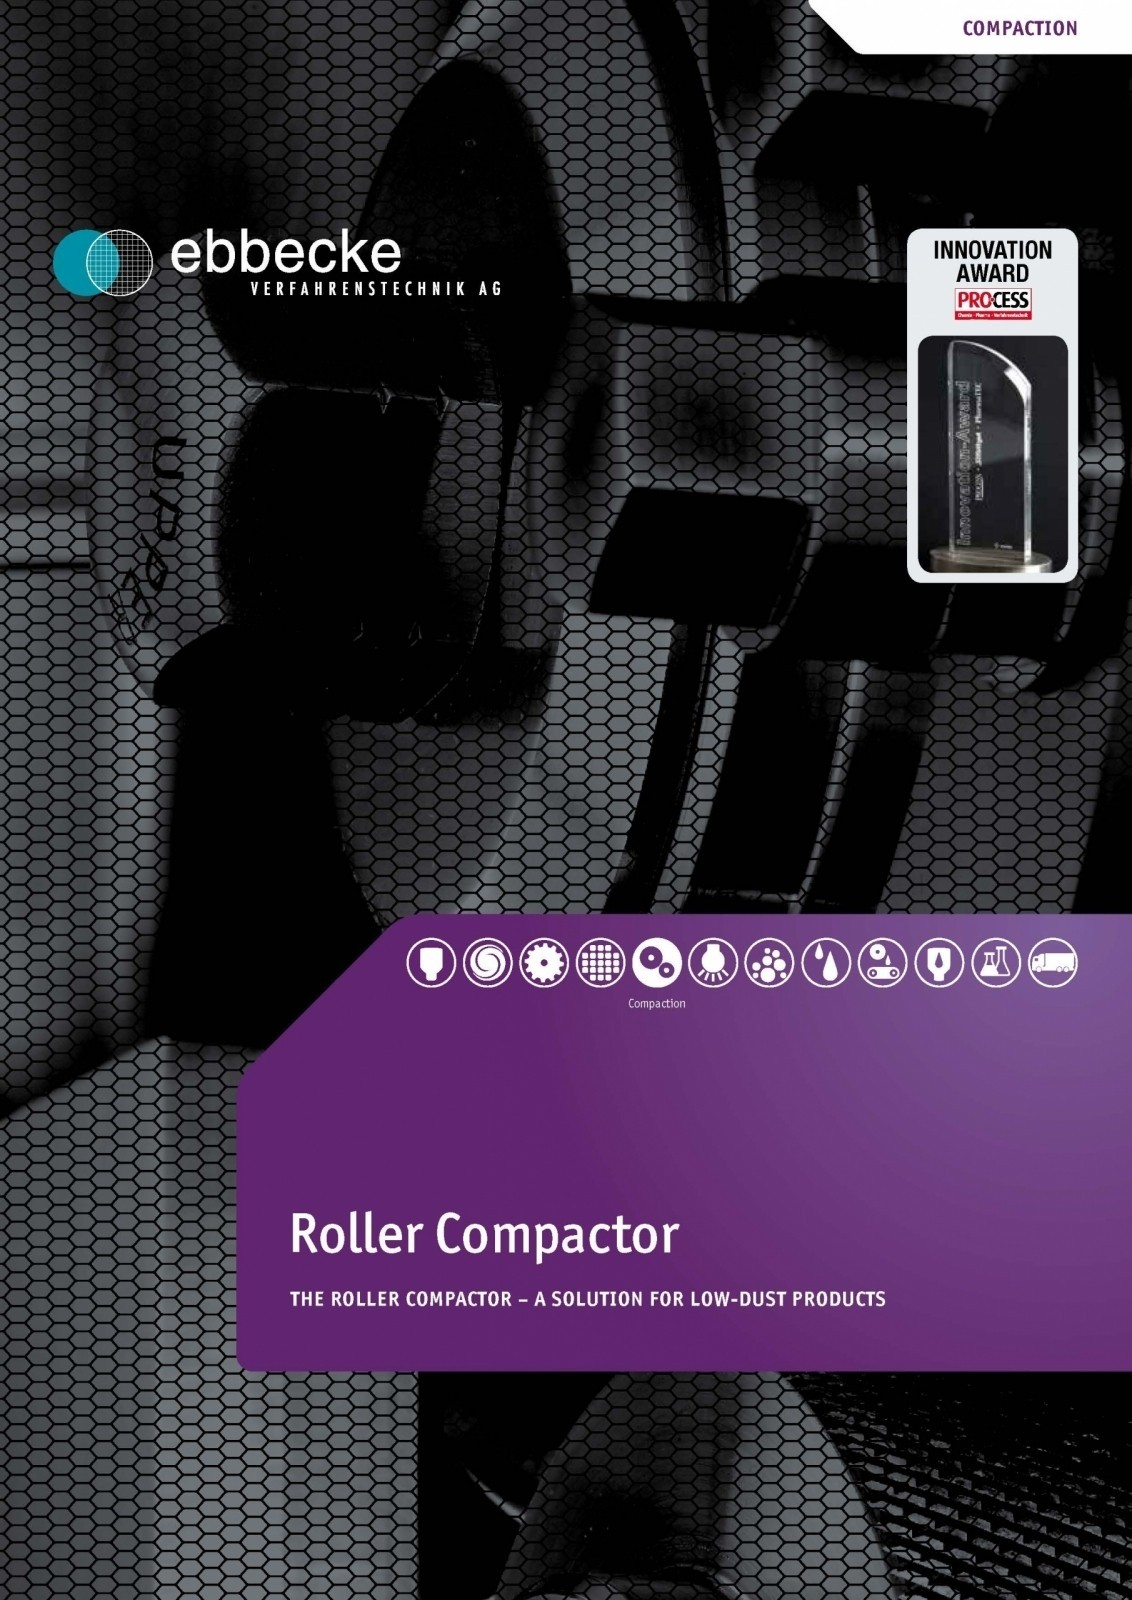 Ebbecke Verfahrenstechnik Flyer Roller Compactor